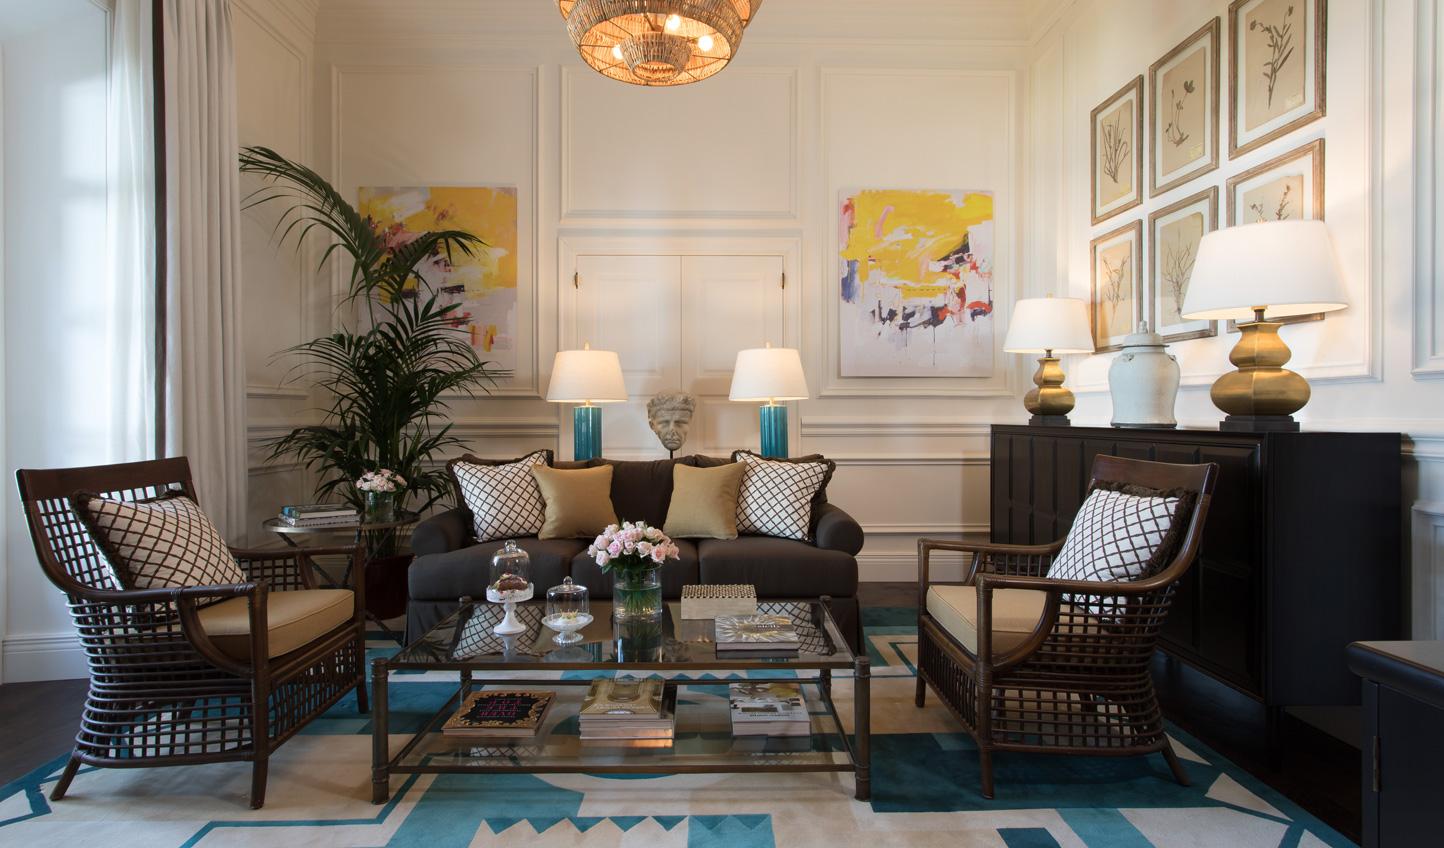 Villa Igiea, Palermo, Sicily | Luxury Hotels in Italy